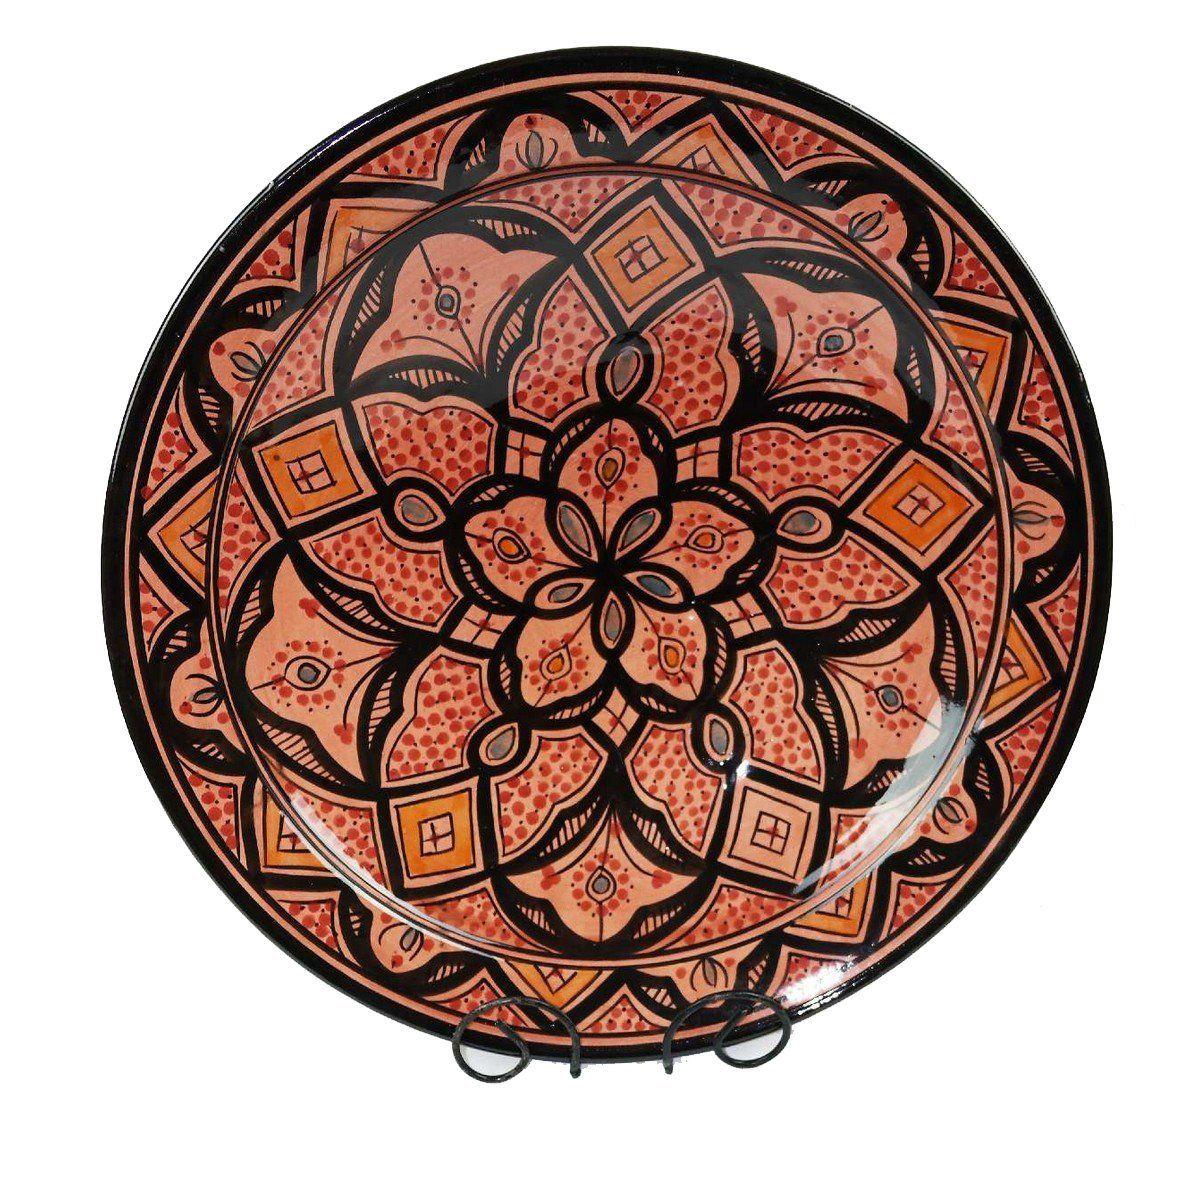 orientalischer keramik teller deko schale handbemalt marokkanisch wandteller xxl ebay. Black Bedroom Furniture Sets. Home Design Ideas